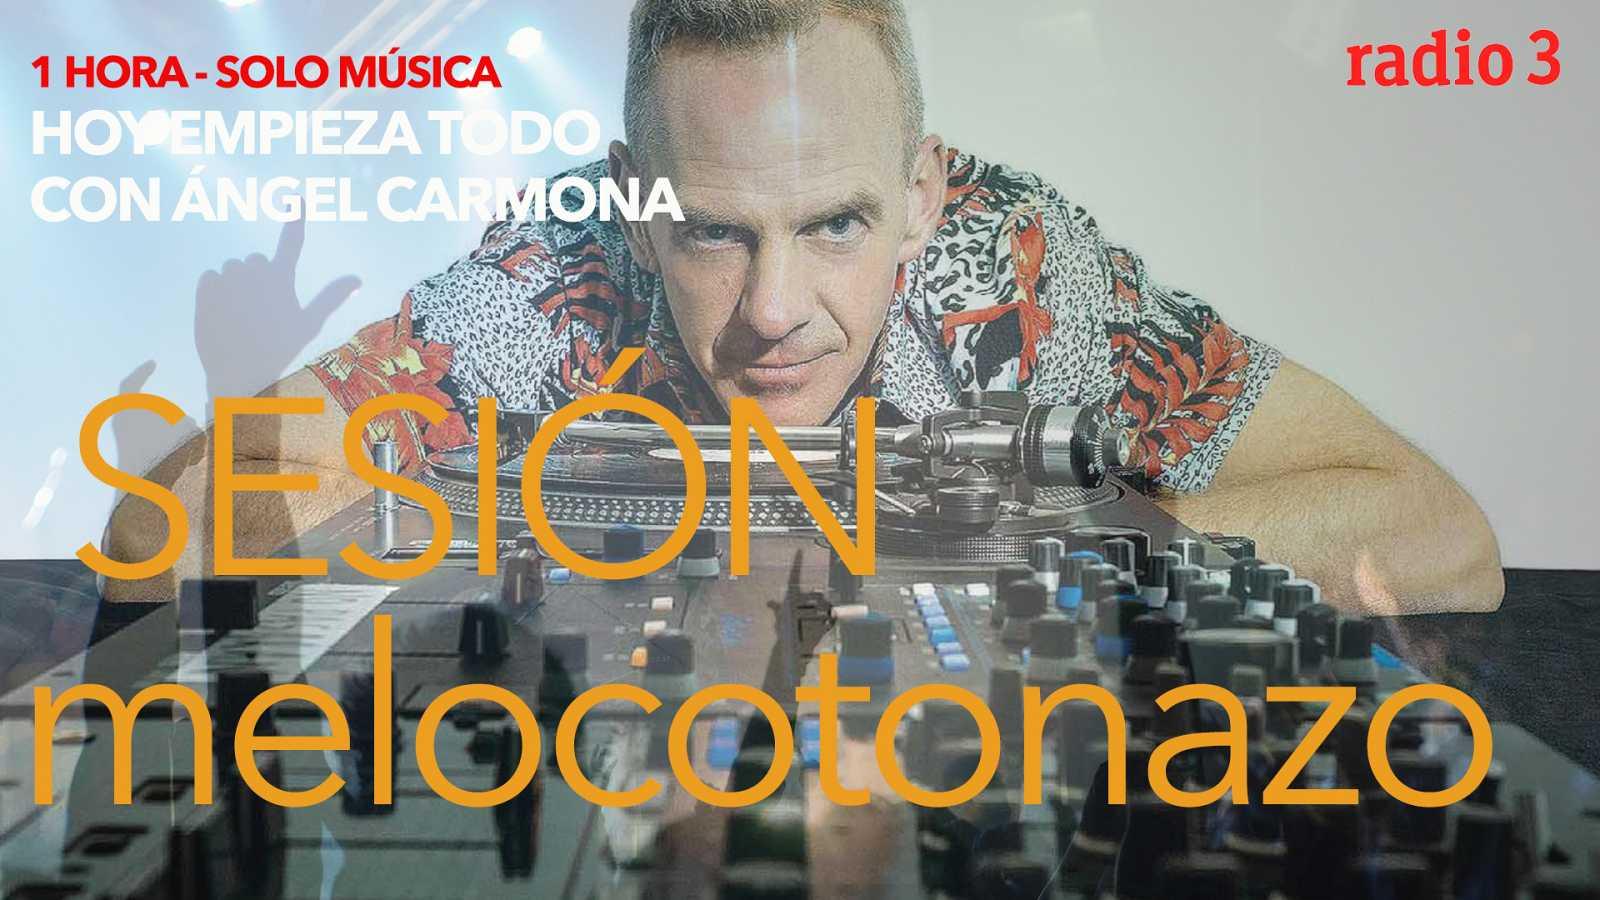 "Hoy empieza todo con Ángel Carmona - ""#SesiónMelocotonazo"": AC/DC, Fatlboy Slim, The Weeknd... - 19/02/21 - escuchar ahora"